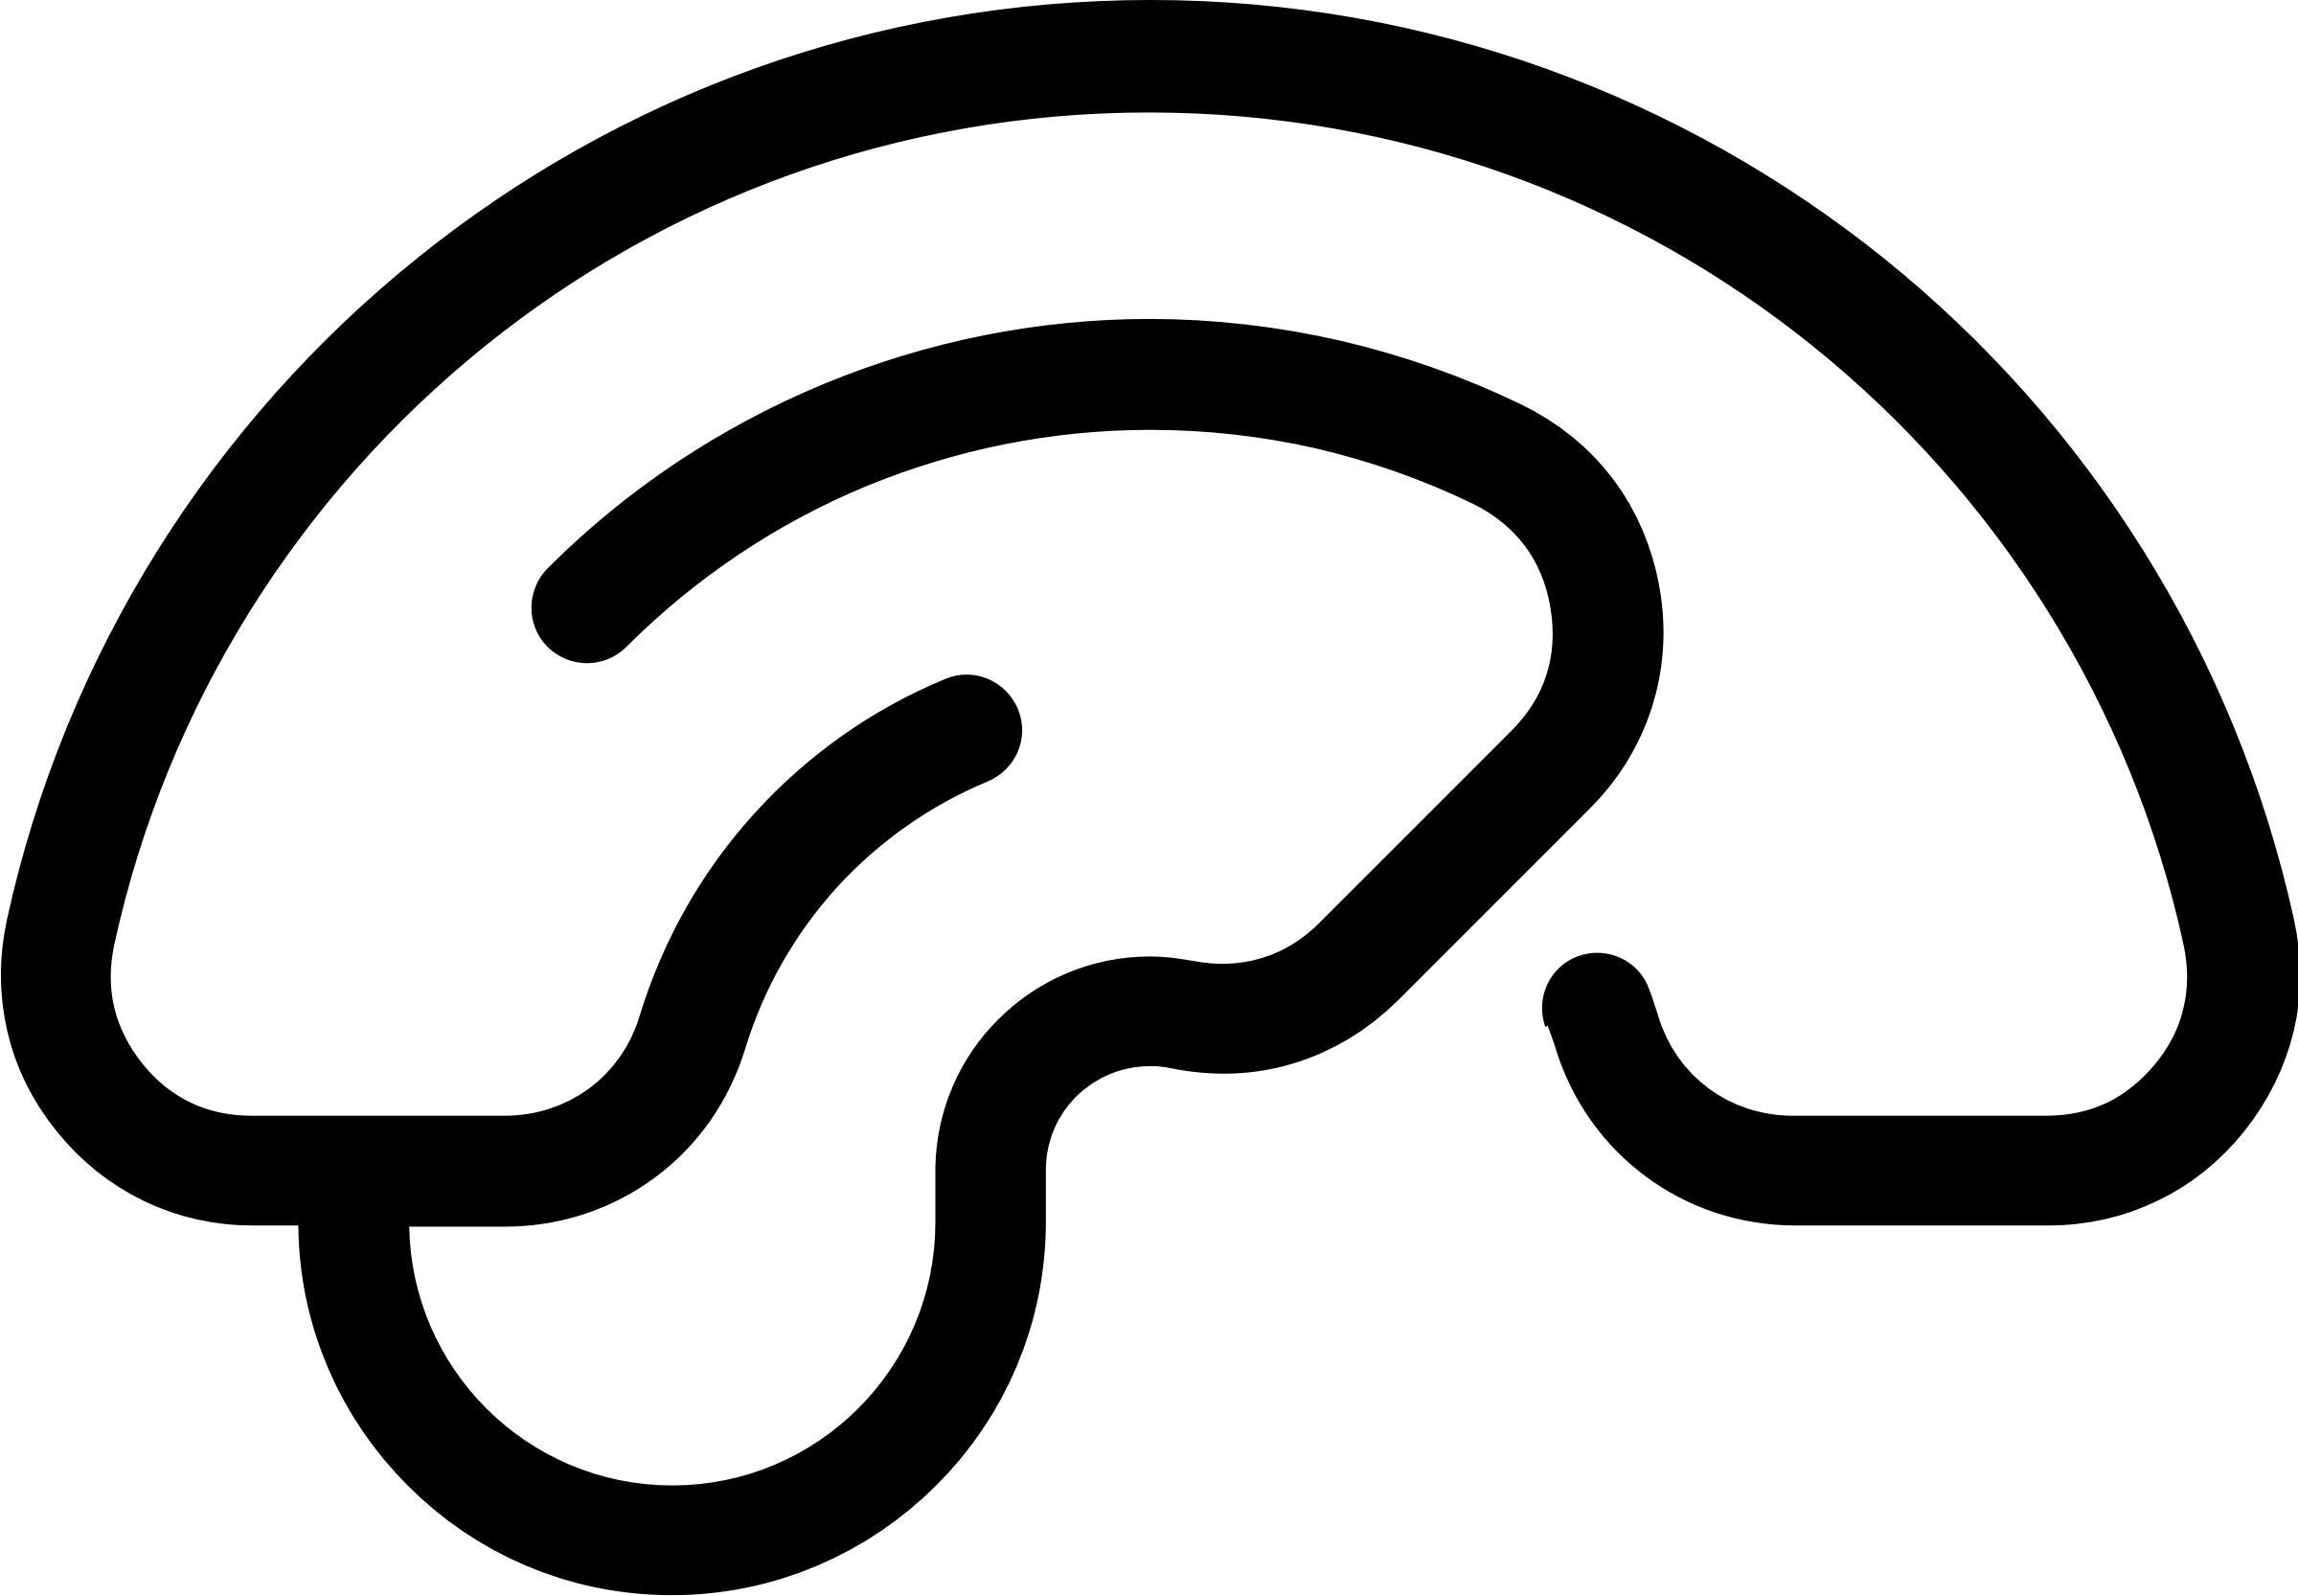 2399x1666 Free Brain Icons Png, Bra N Images